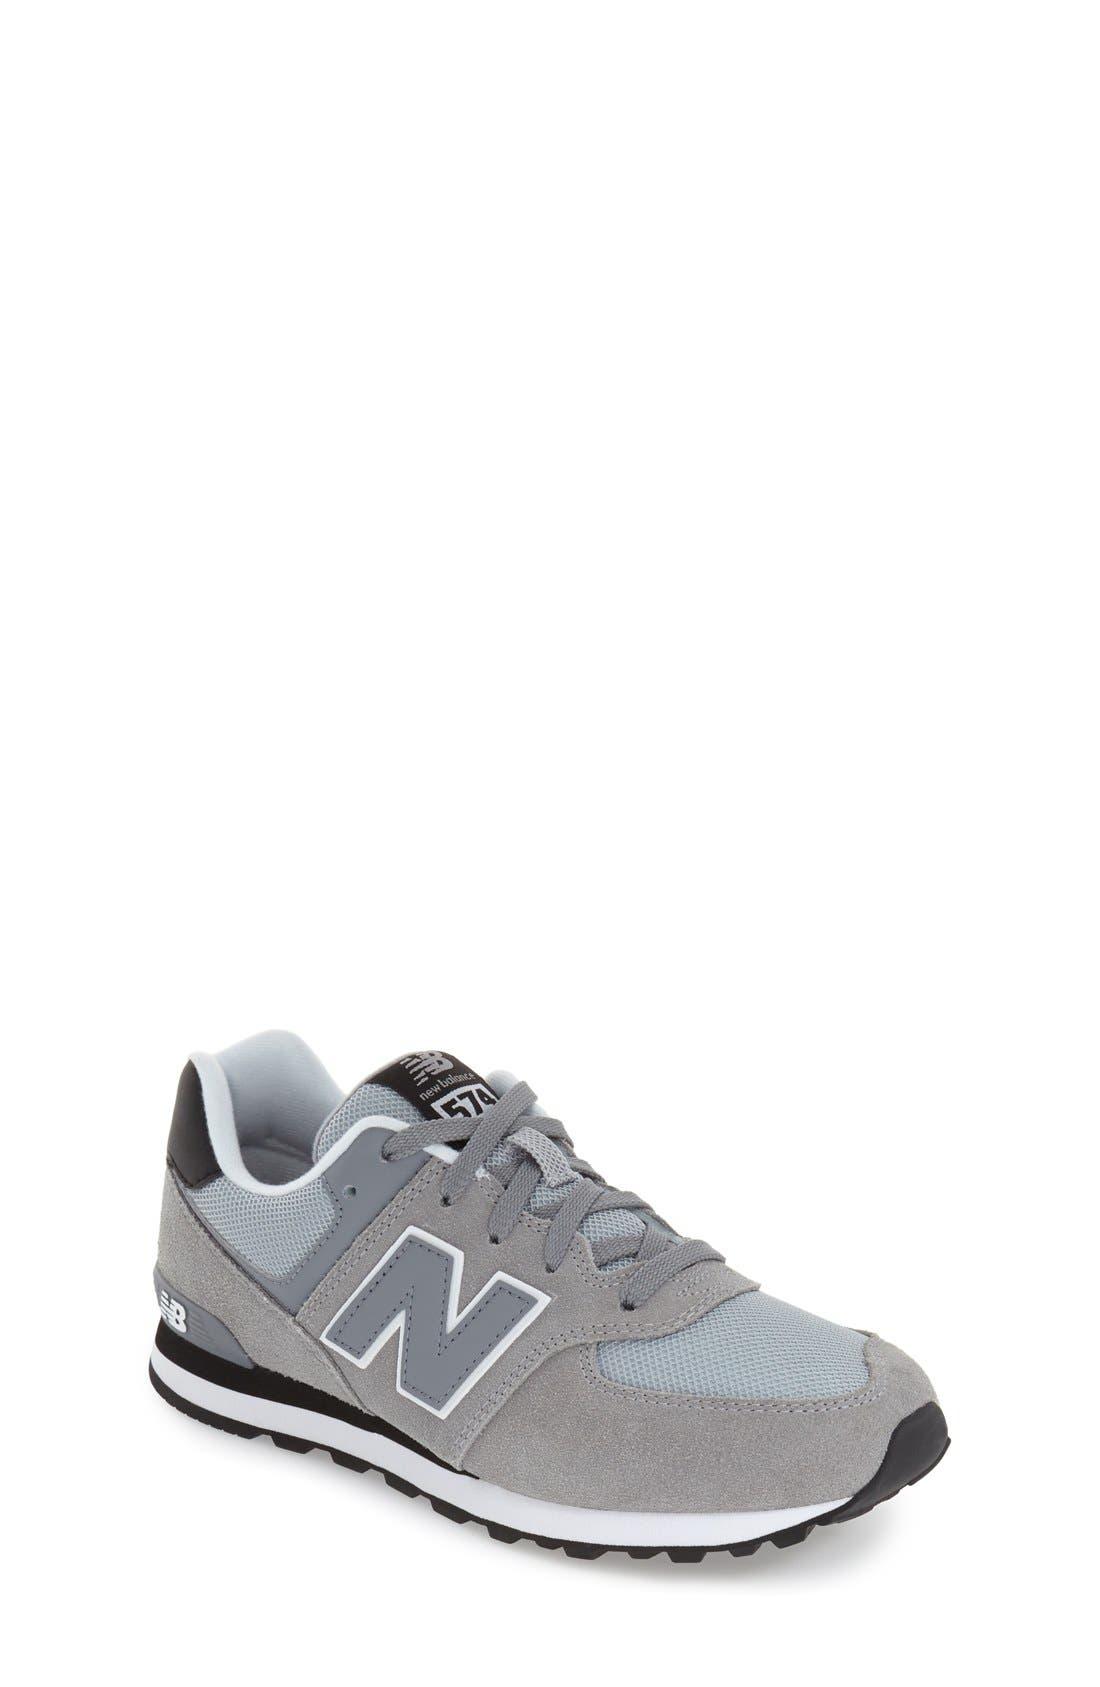 Main Image - New Balance '574 Core Plus' Sneaker (Baby, Walker, Toddler, Little Kid & Big Kid)